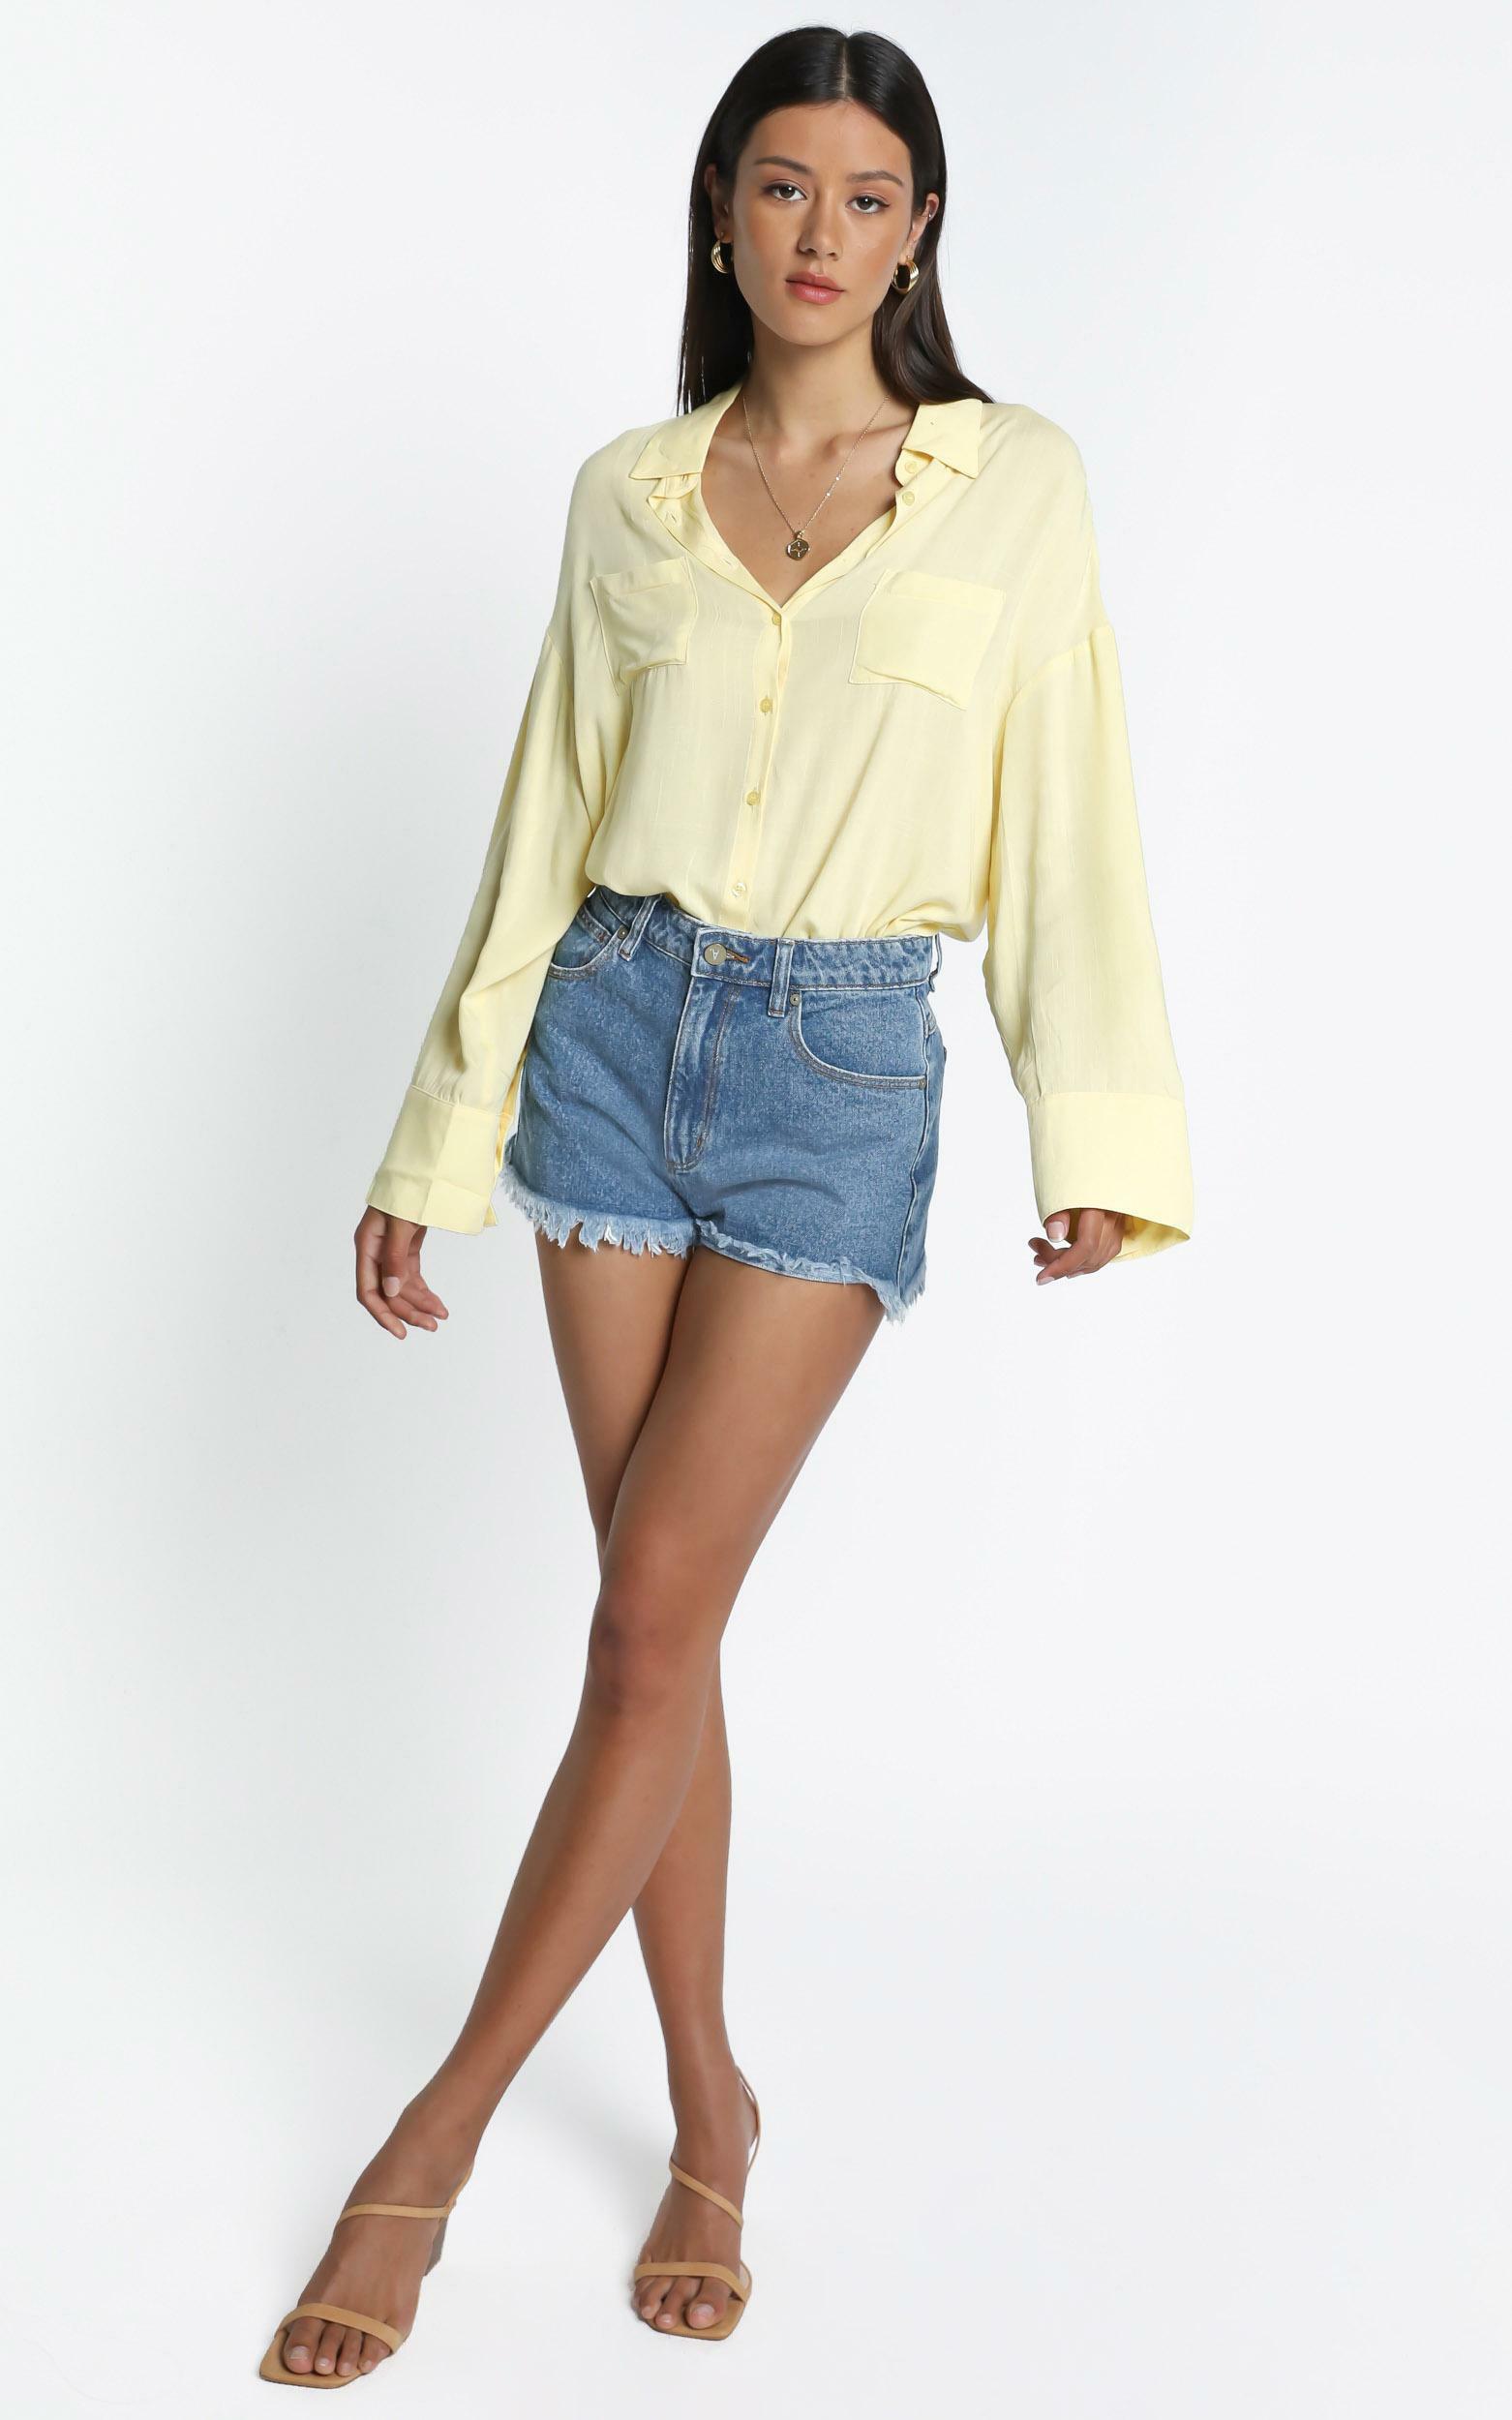 Amaka Shirt in Lemon - 14, YEL1, hi-res image number null